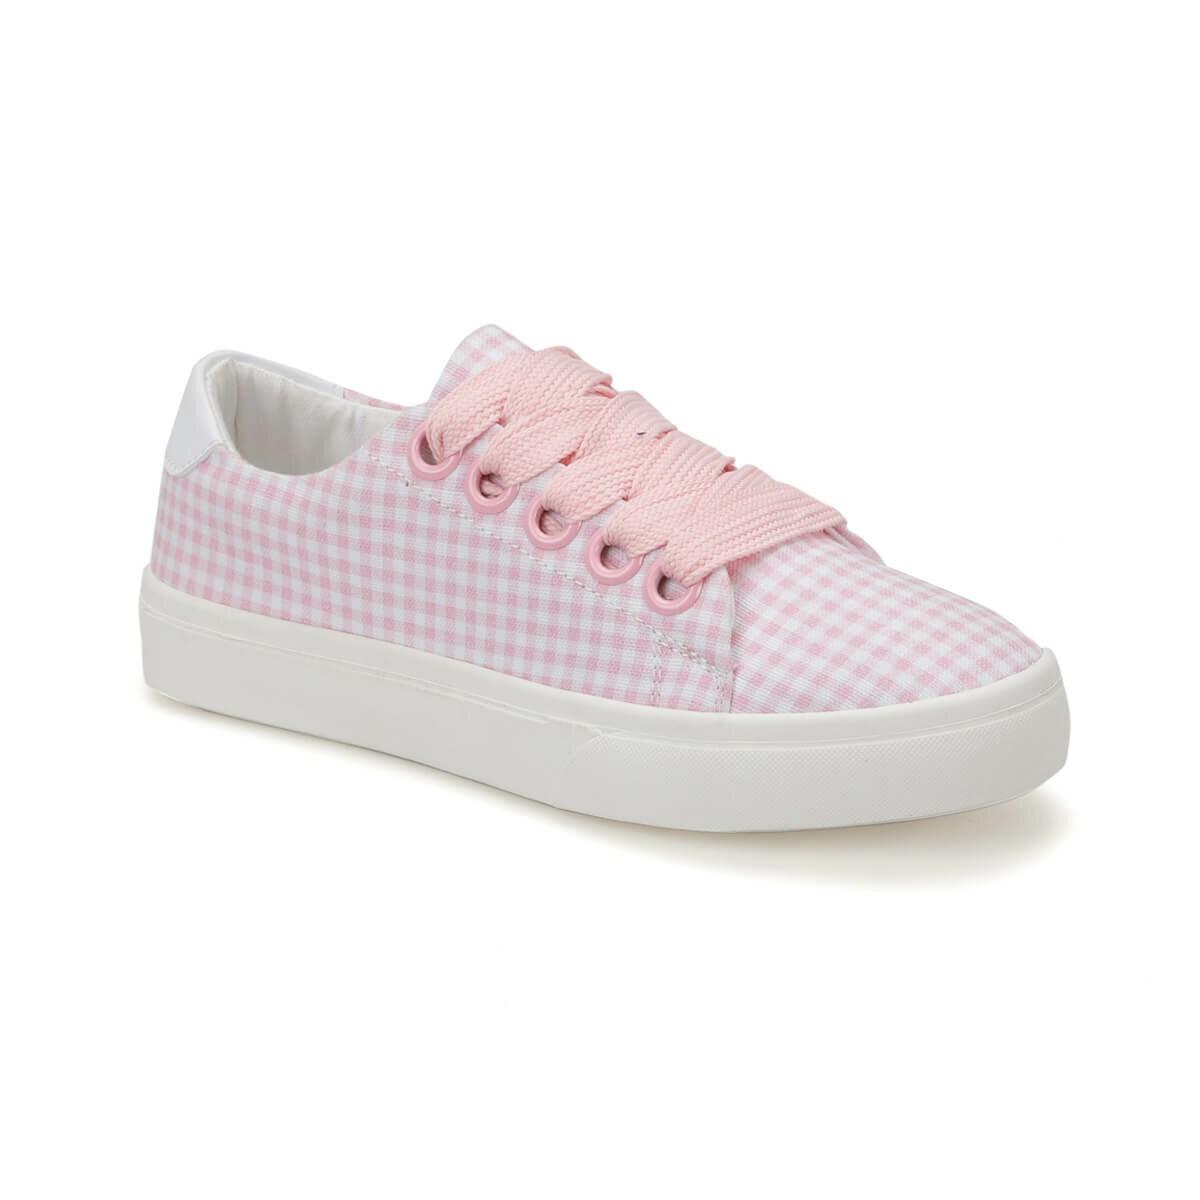 FLO CS19005 Pink Women 'S Sneaker Shoes Art Bella